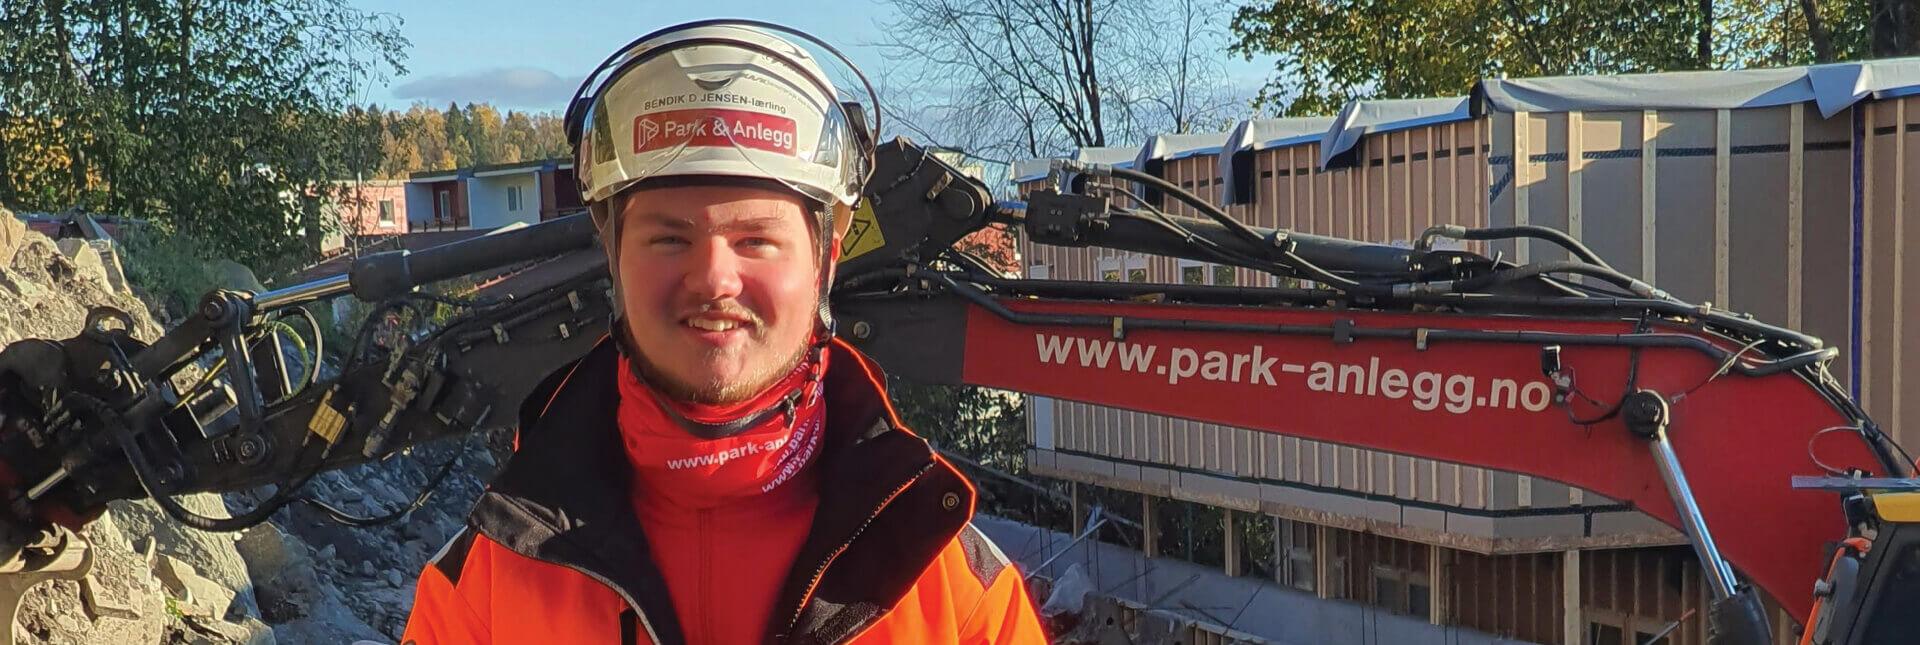 Lærling Bendik Dahlin Jensen